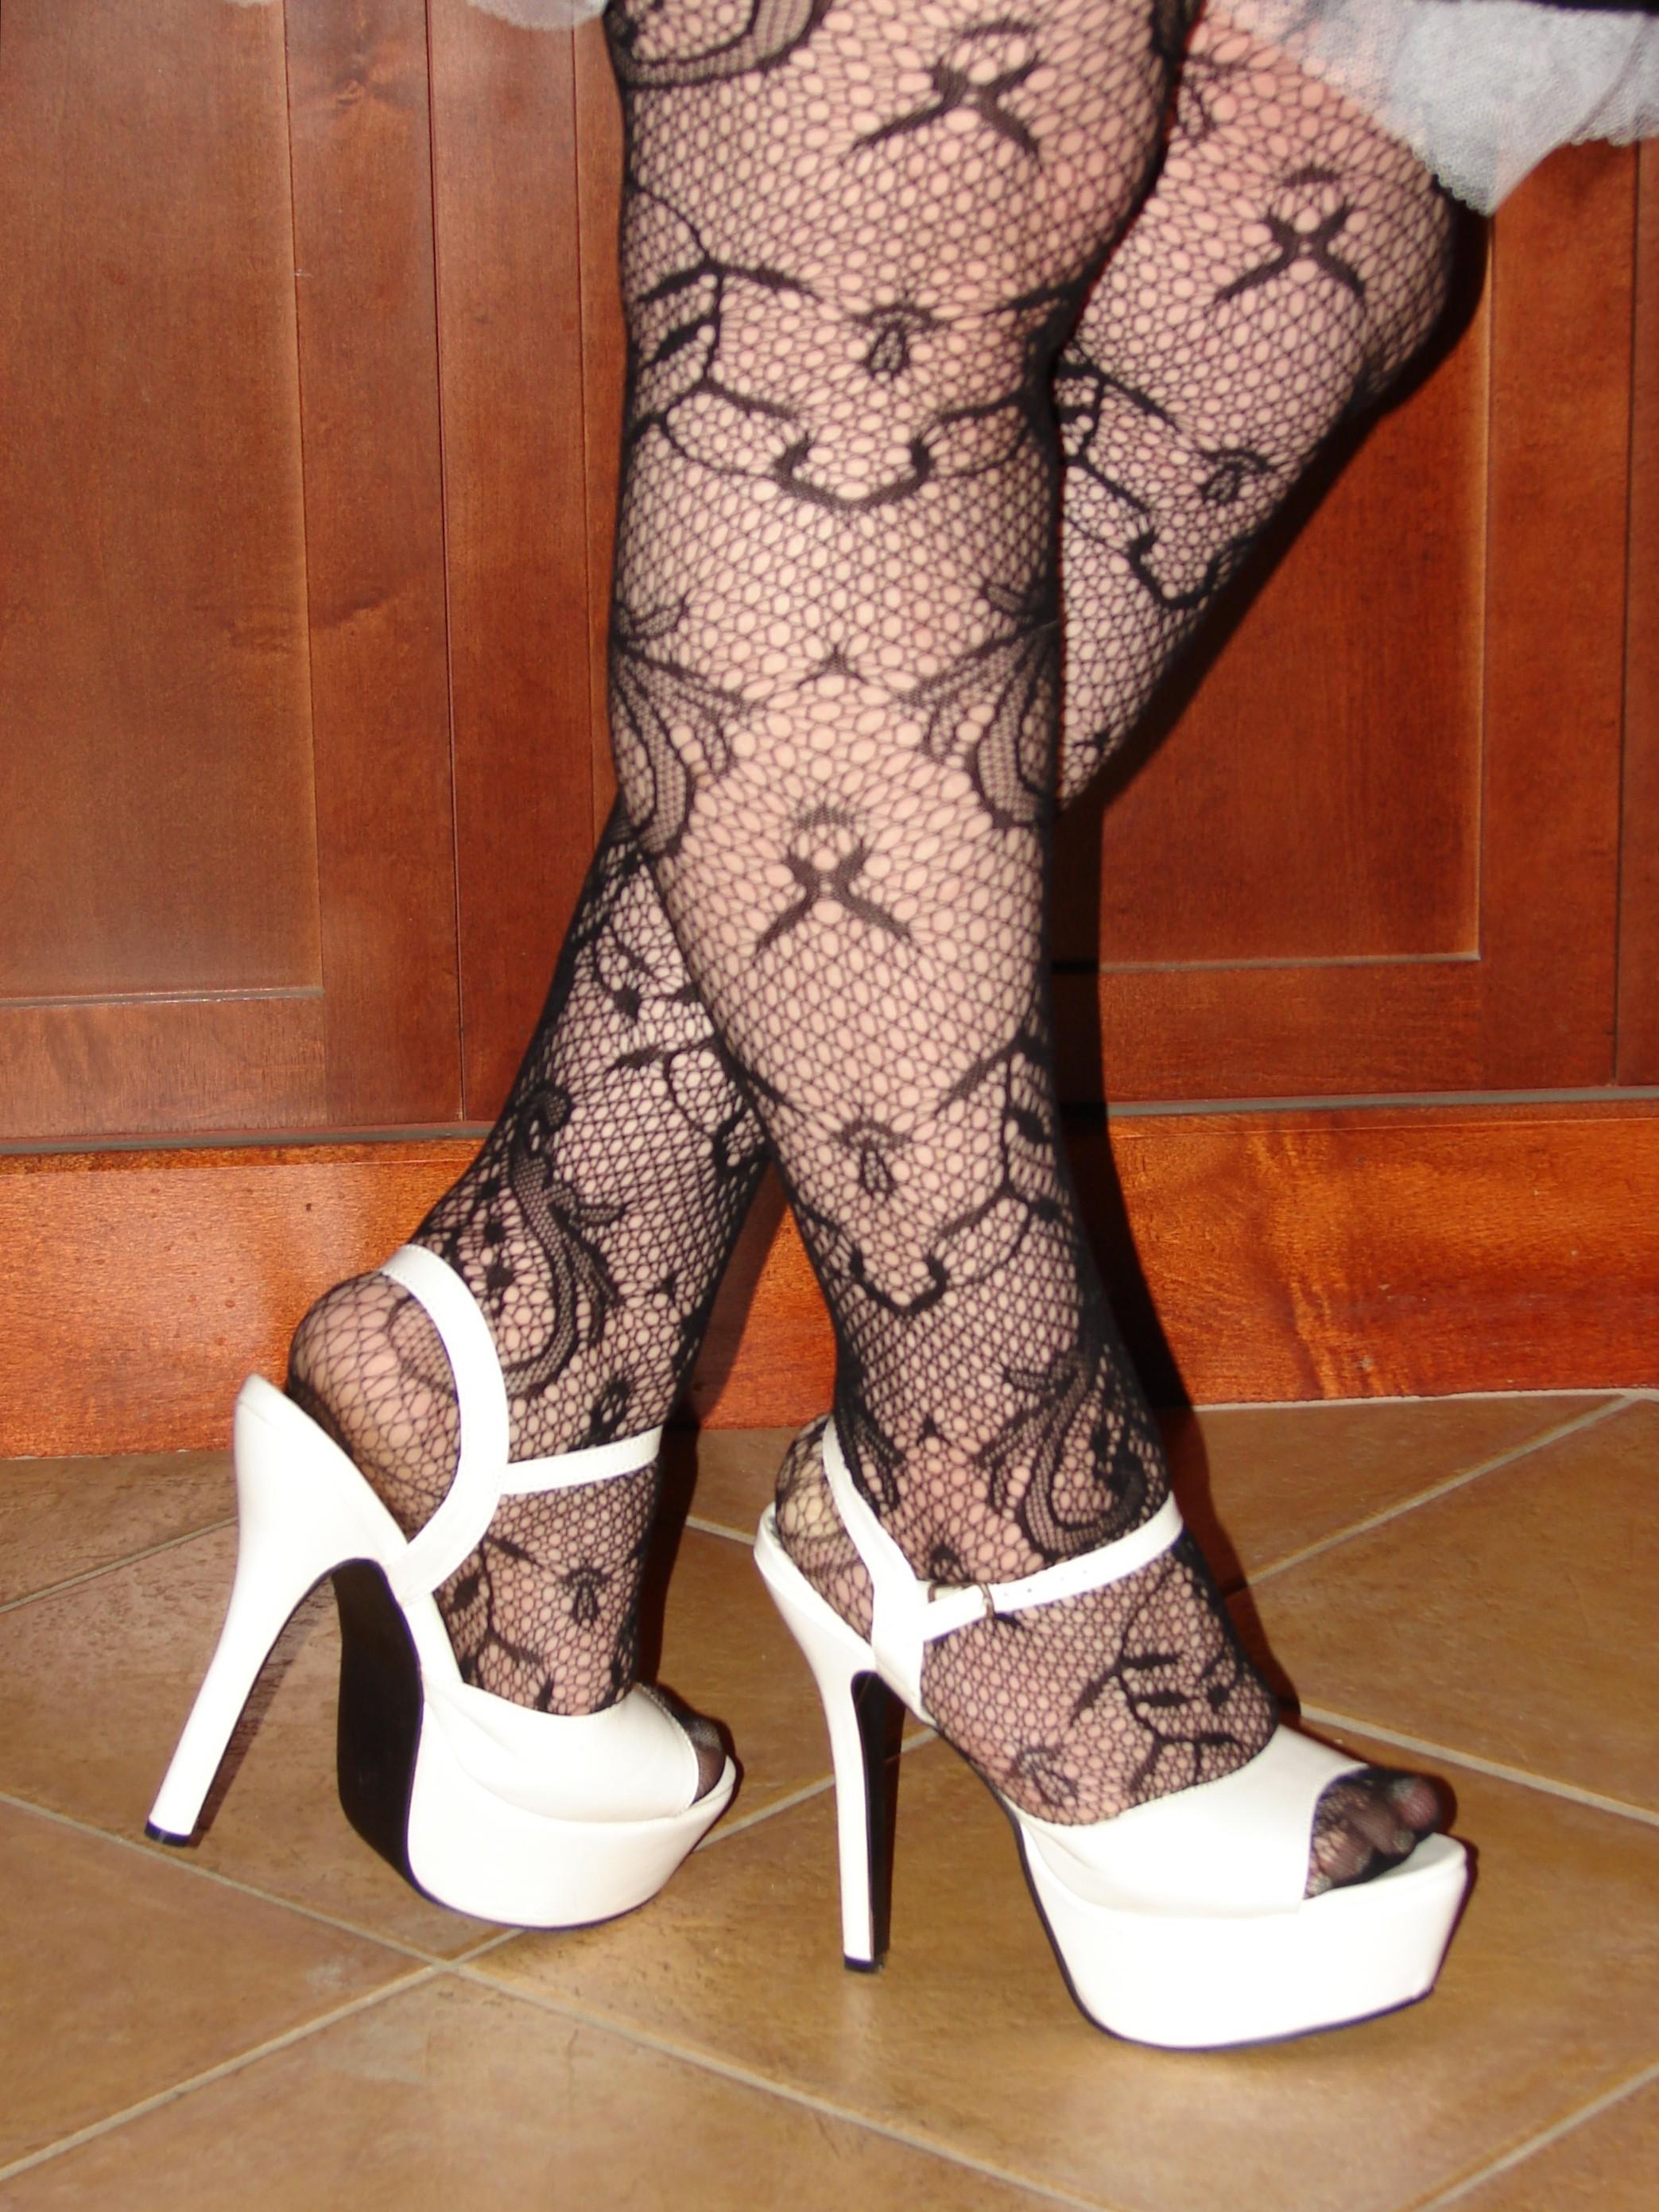 Habilisa gotta love fishnets and heels